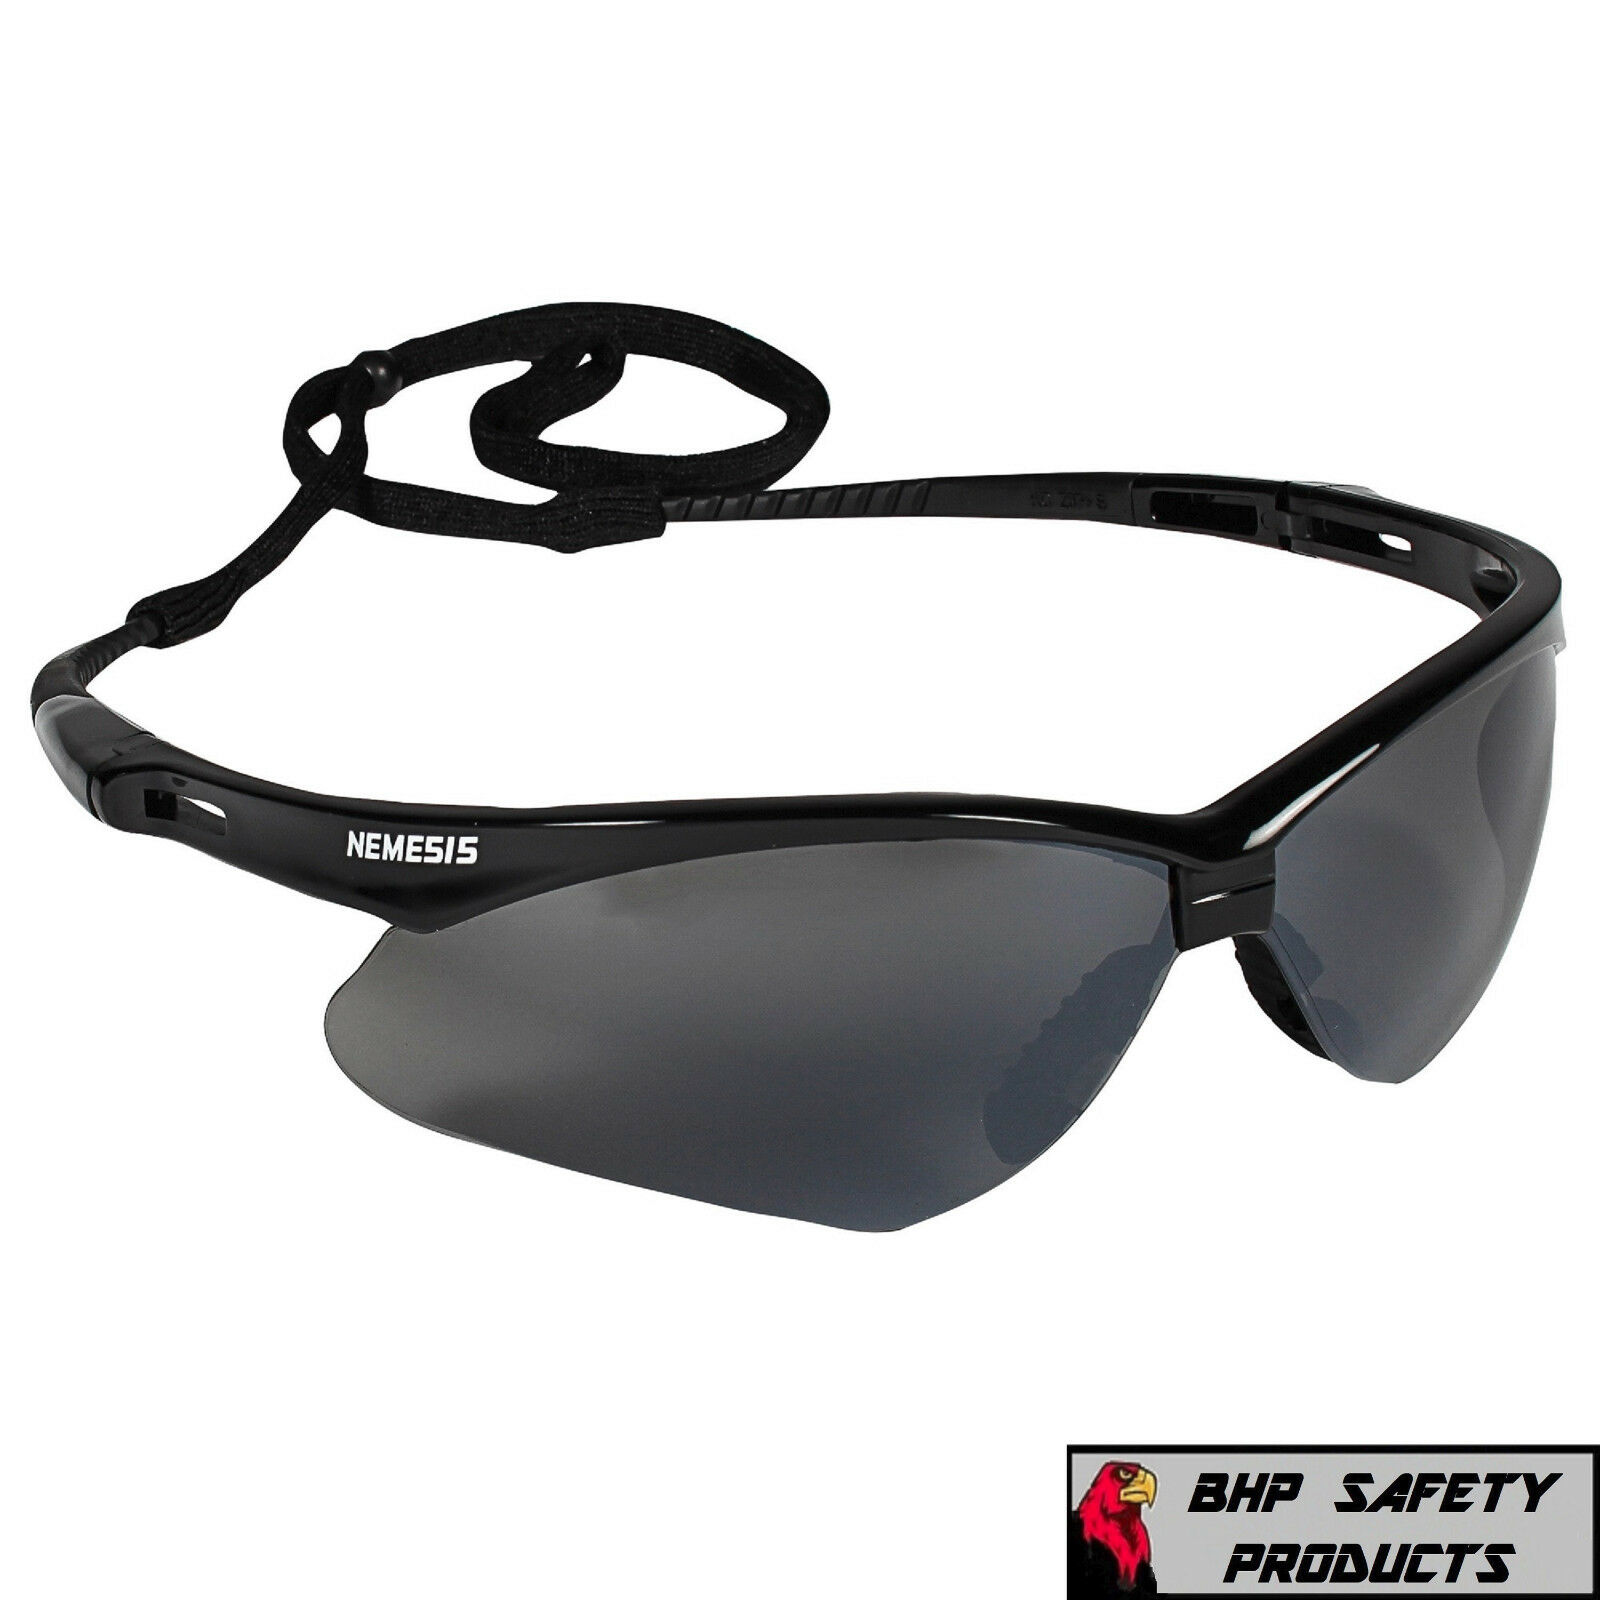 3 PAIR JACKSON NEMESIS 3000356 SAFETY GLASSES BLACK SMOKE MIRROR LENS GRAY